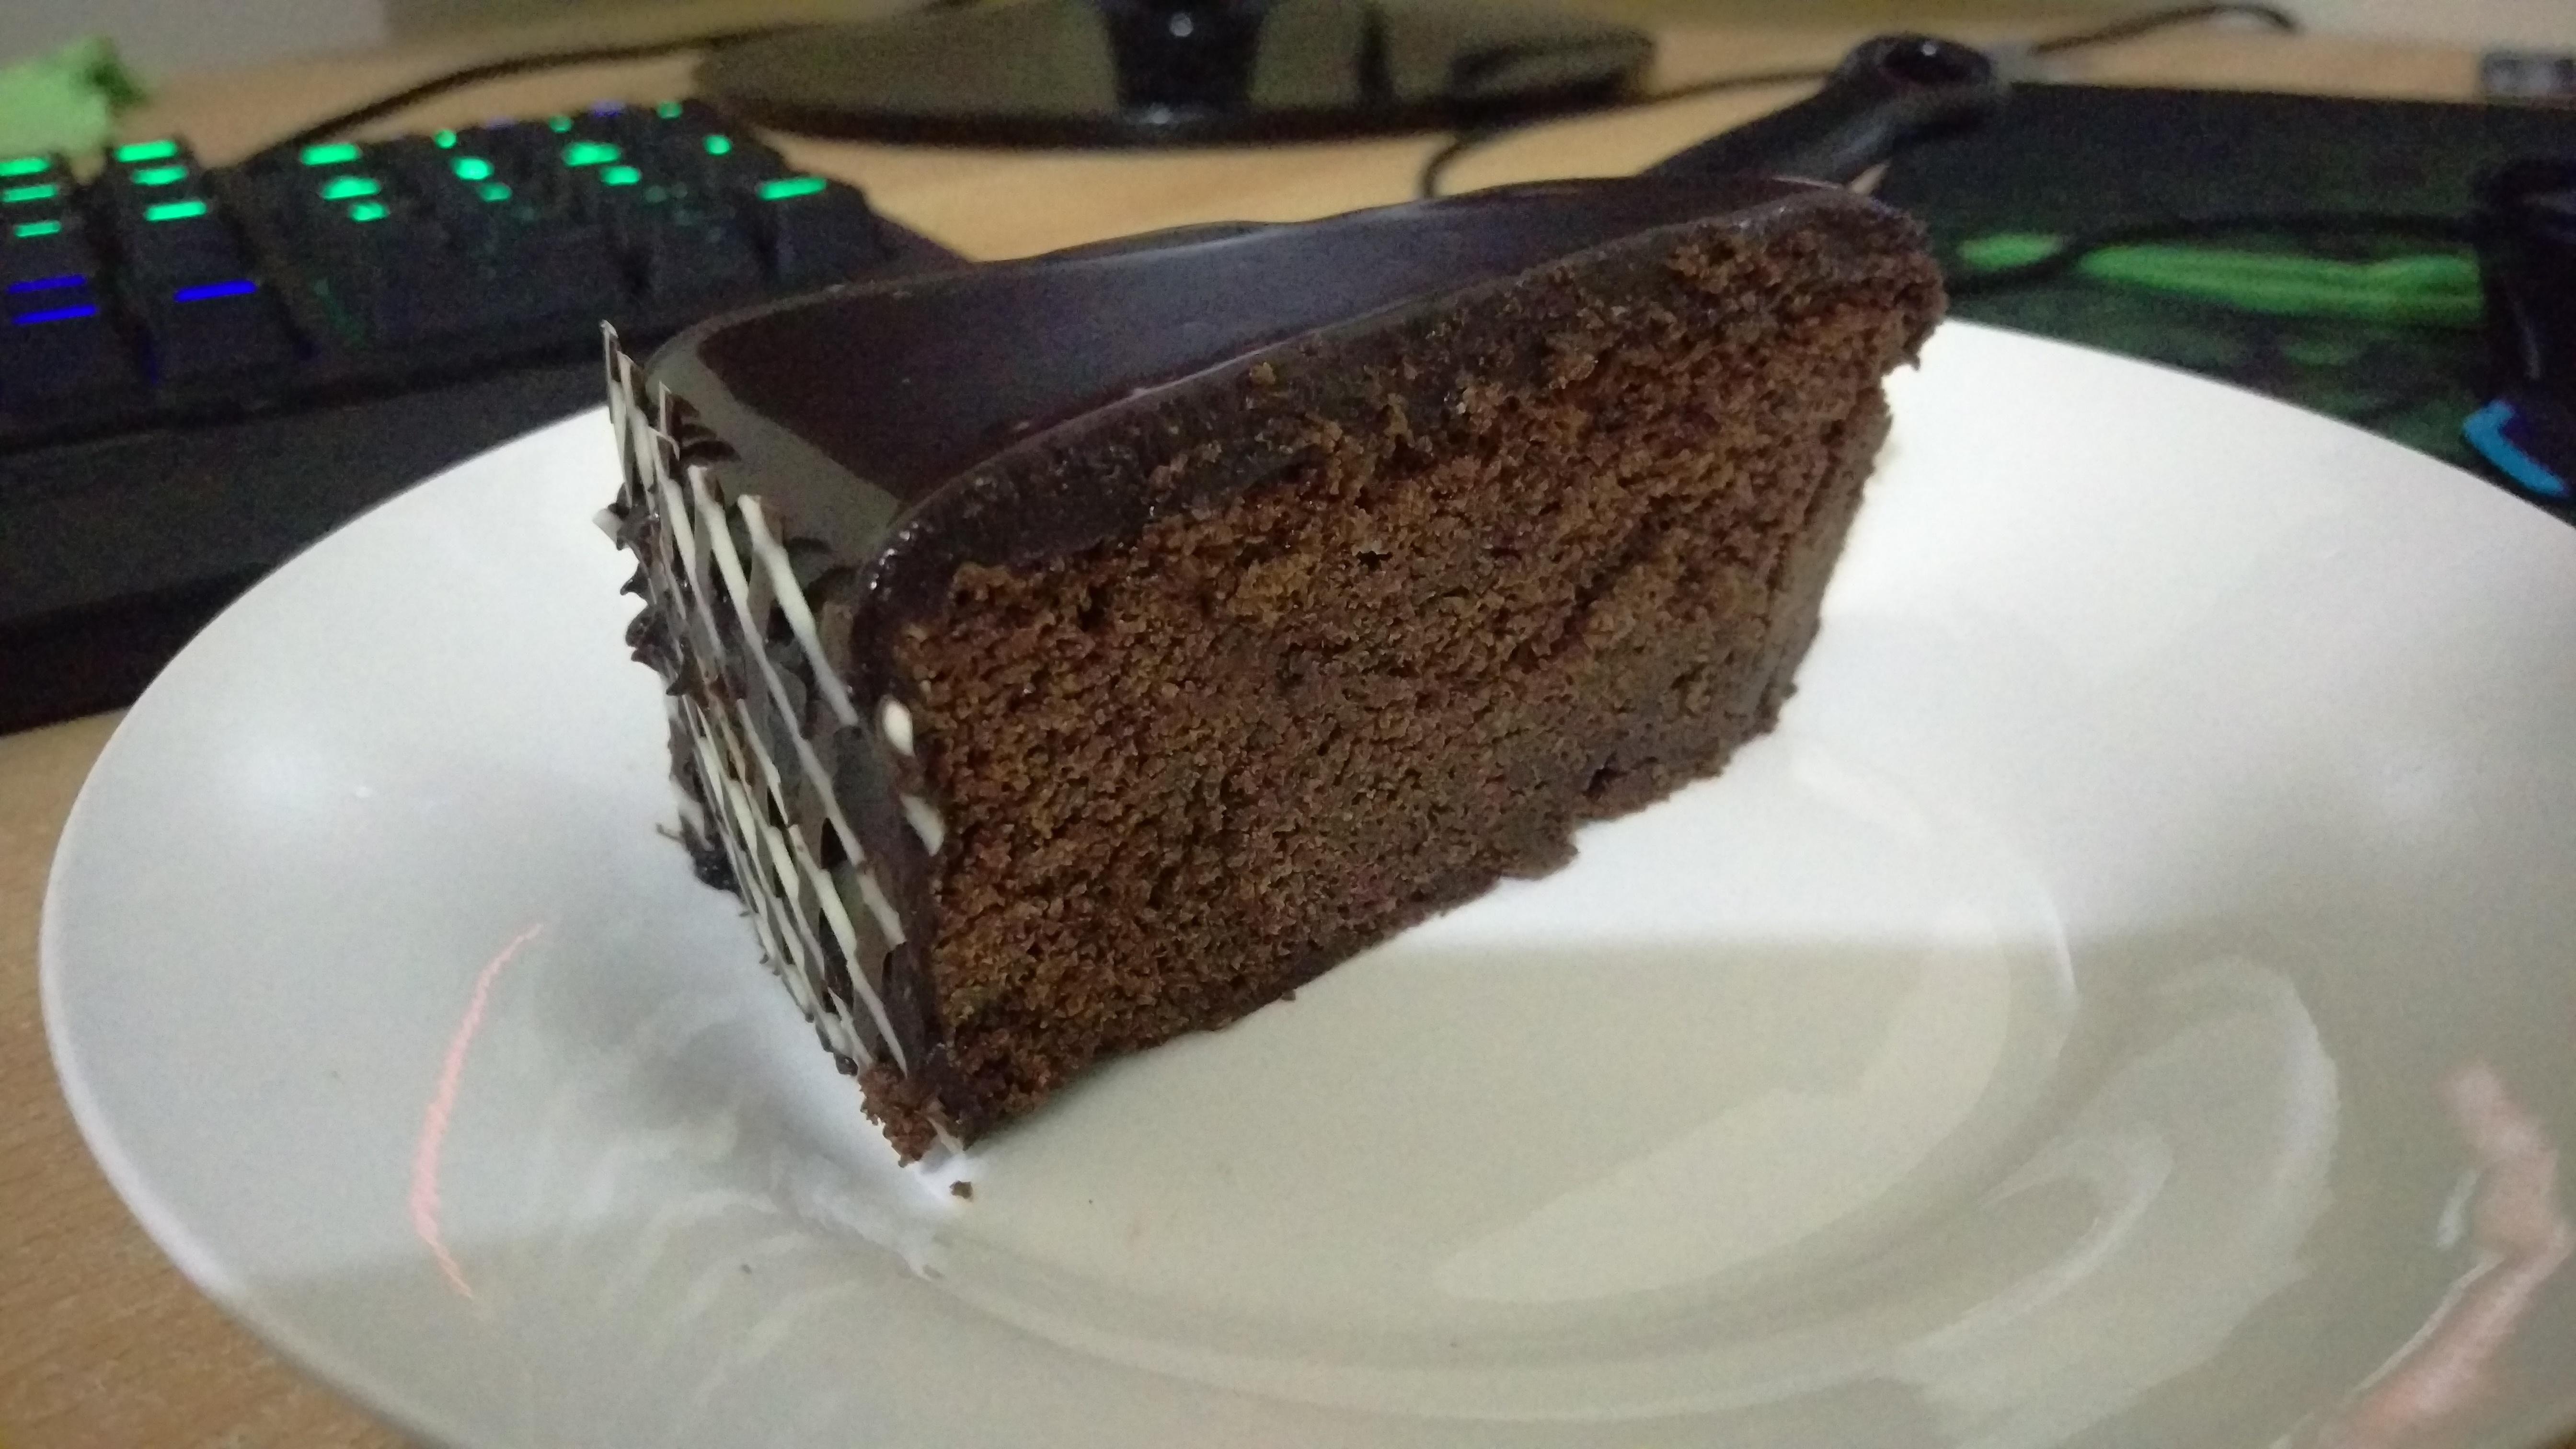 [I Ate] Chocolate Mud Cake http://ift.tt/2lynpJc